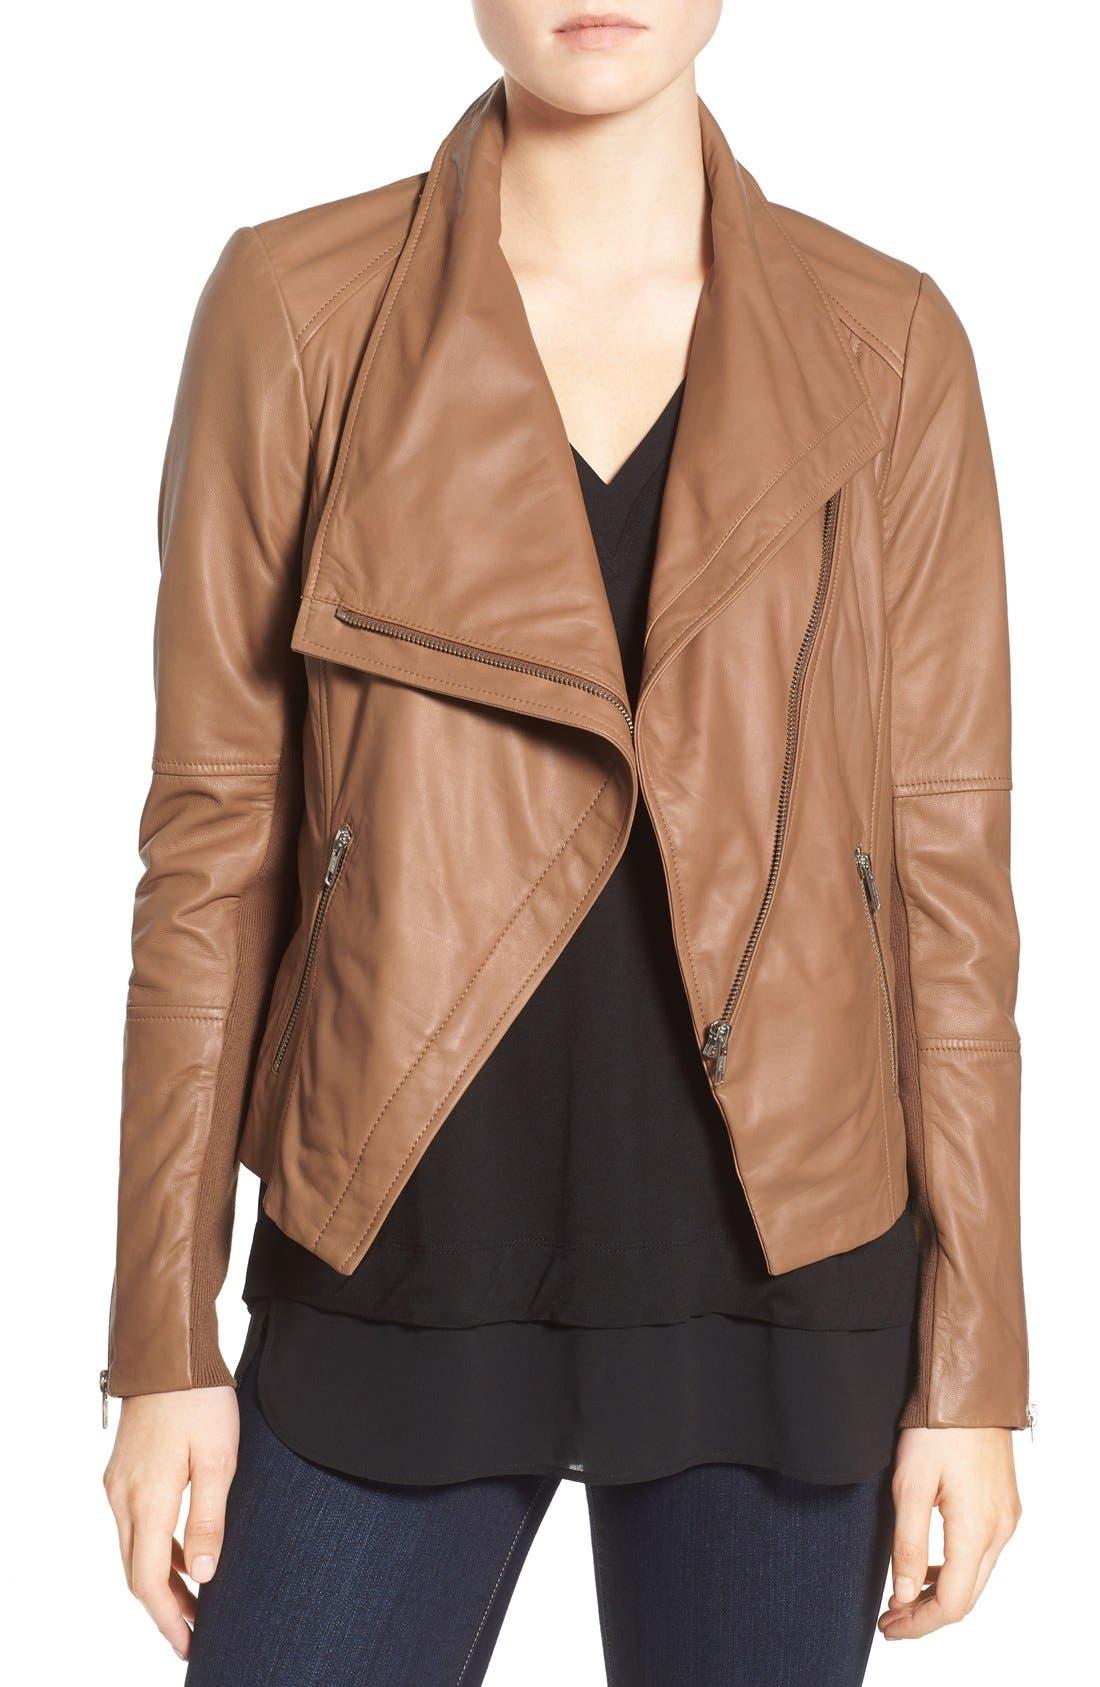 Alternate Image 1 Selected - Trouvé Drape Front Leather Jacket